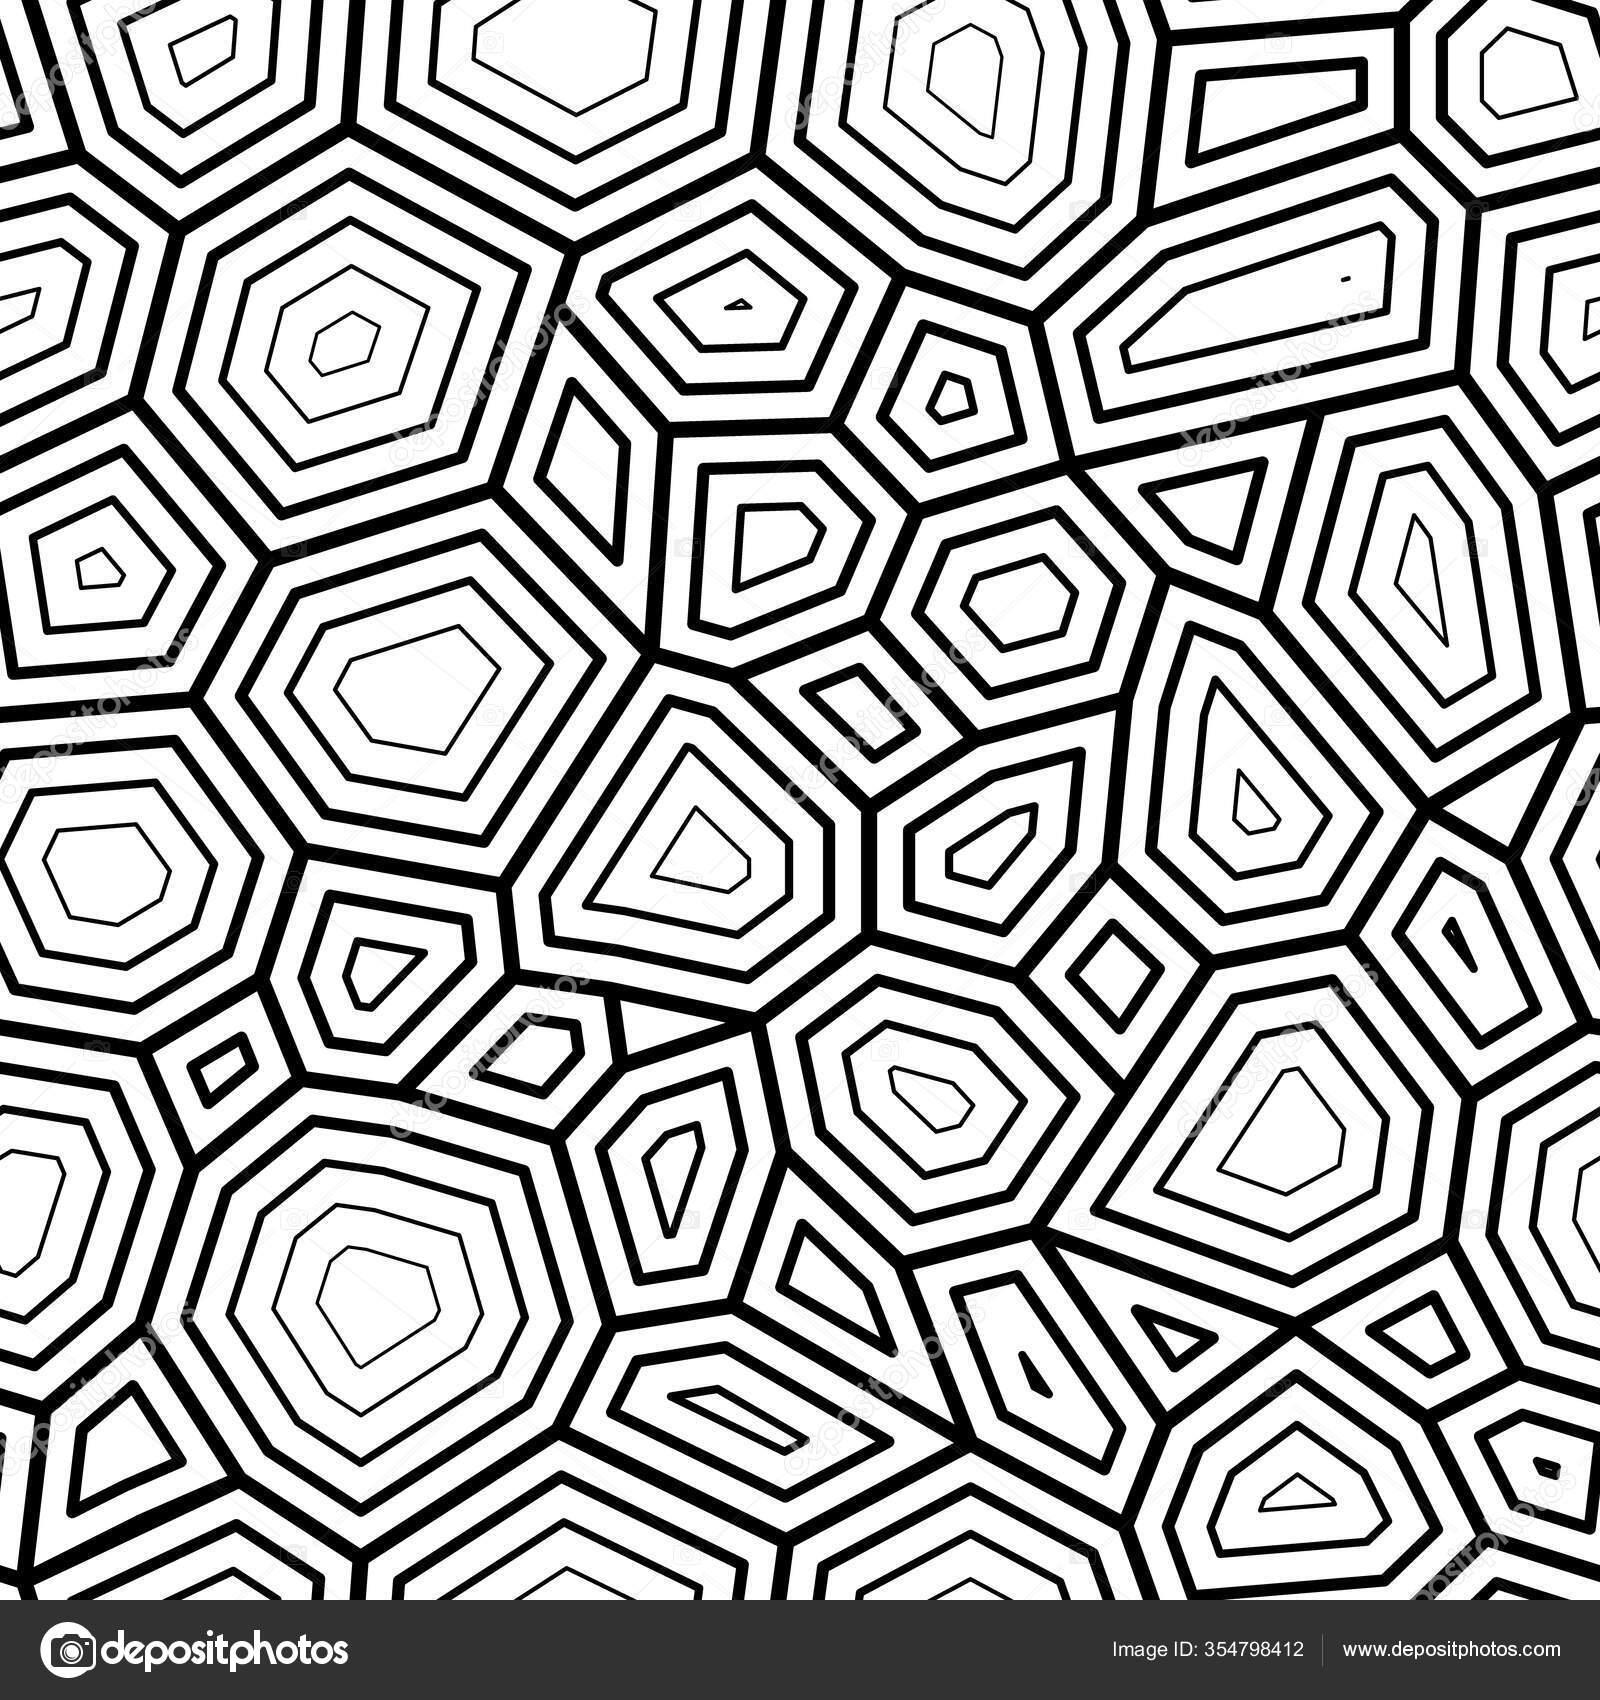 Seamless Pattern Ornate Turtle Shell Pattern Vector Seamless Pattern With Hand Drawn Doodle Turtle Shell Vector Stock Illustration Eps10 Stock Vector C Shekoru 354798412,Pet Tortoise Breeds